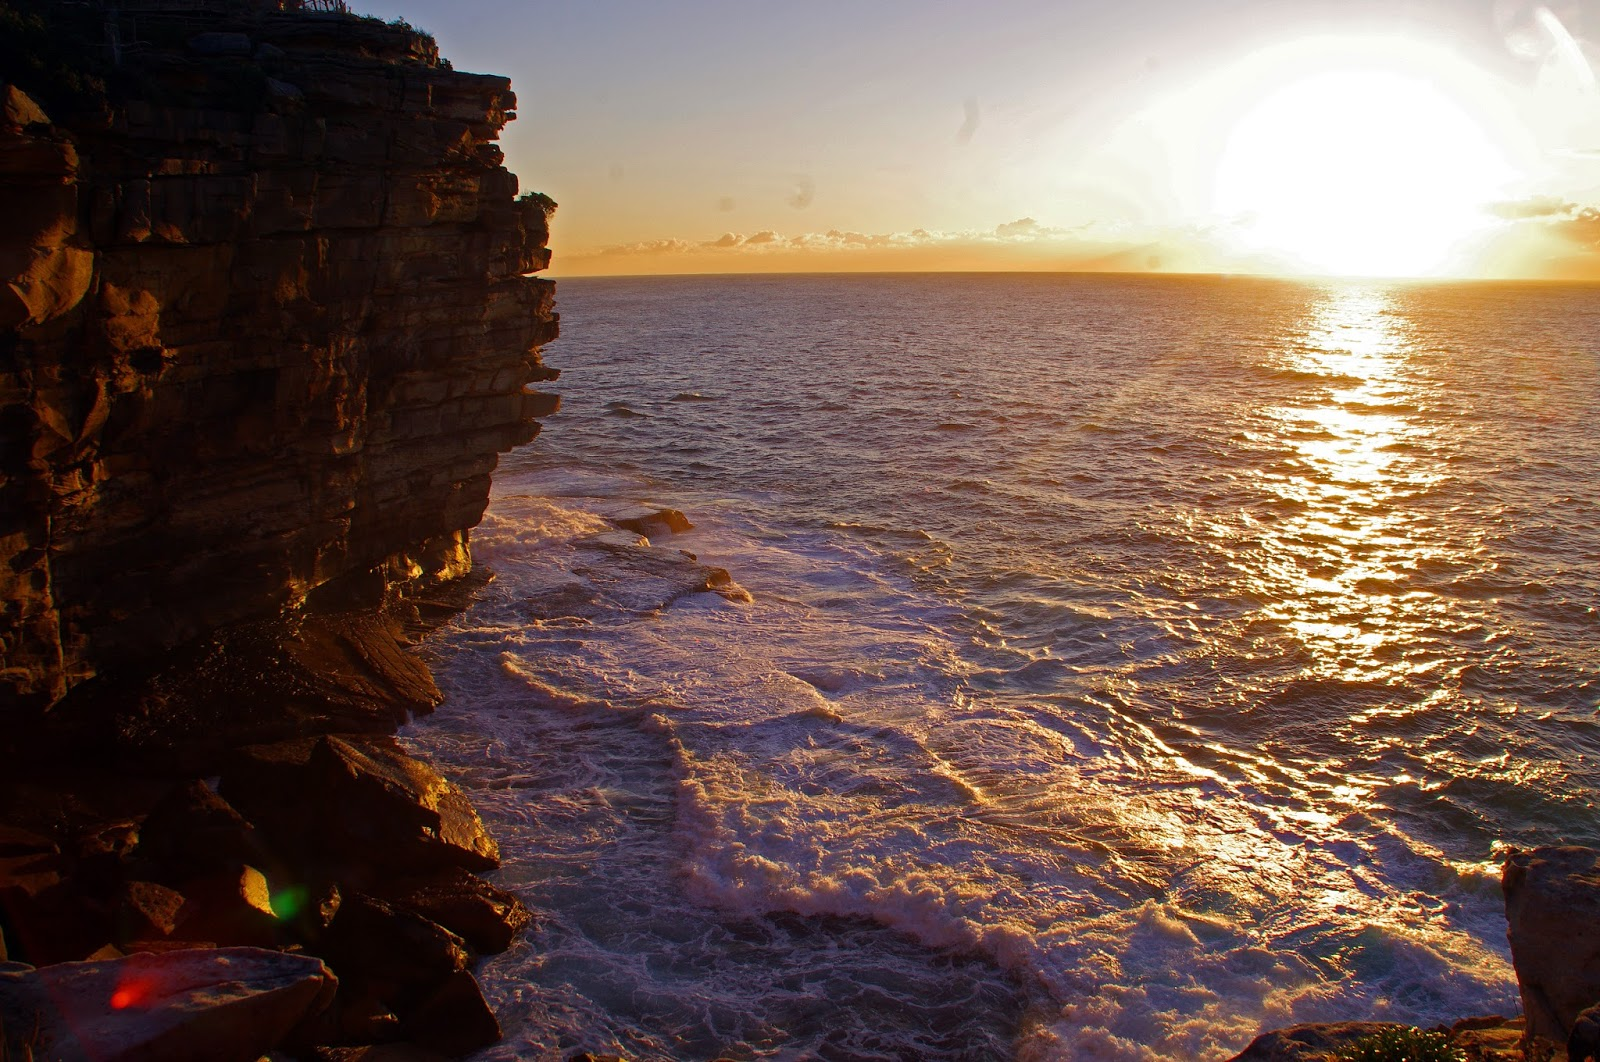 Red sunrise from Sydney harbour national park